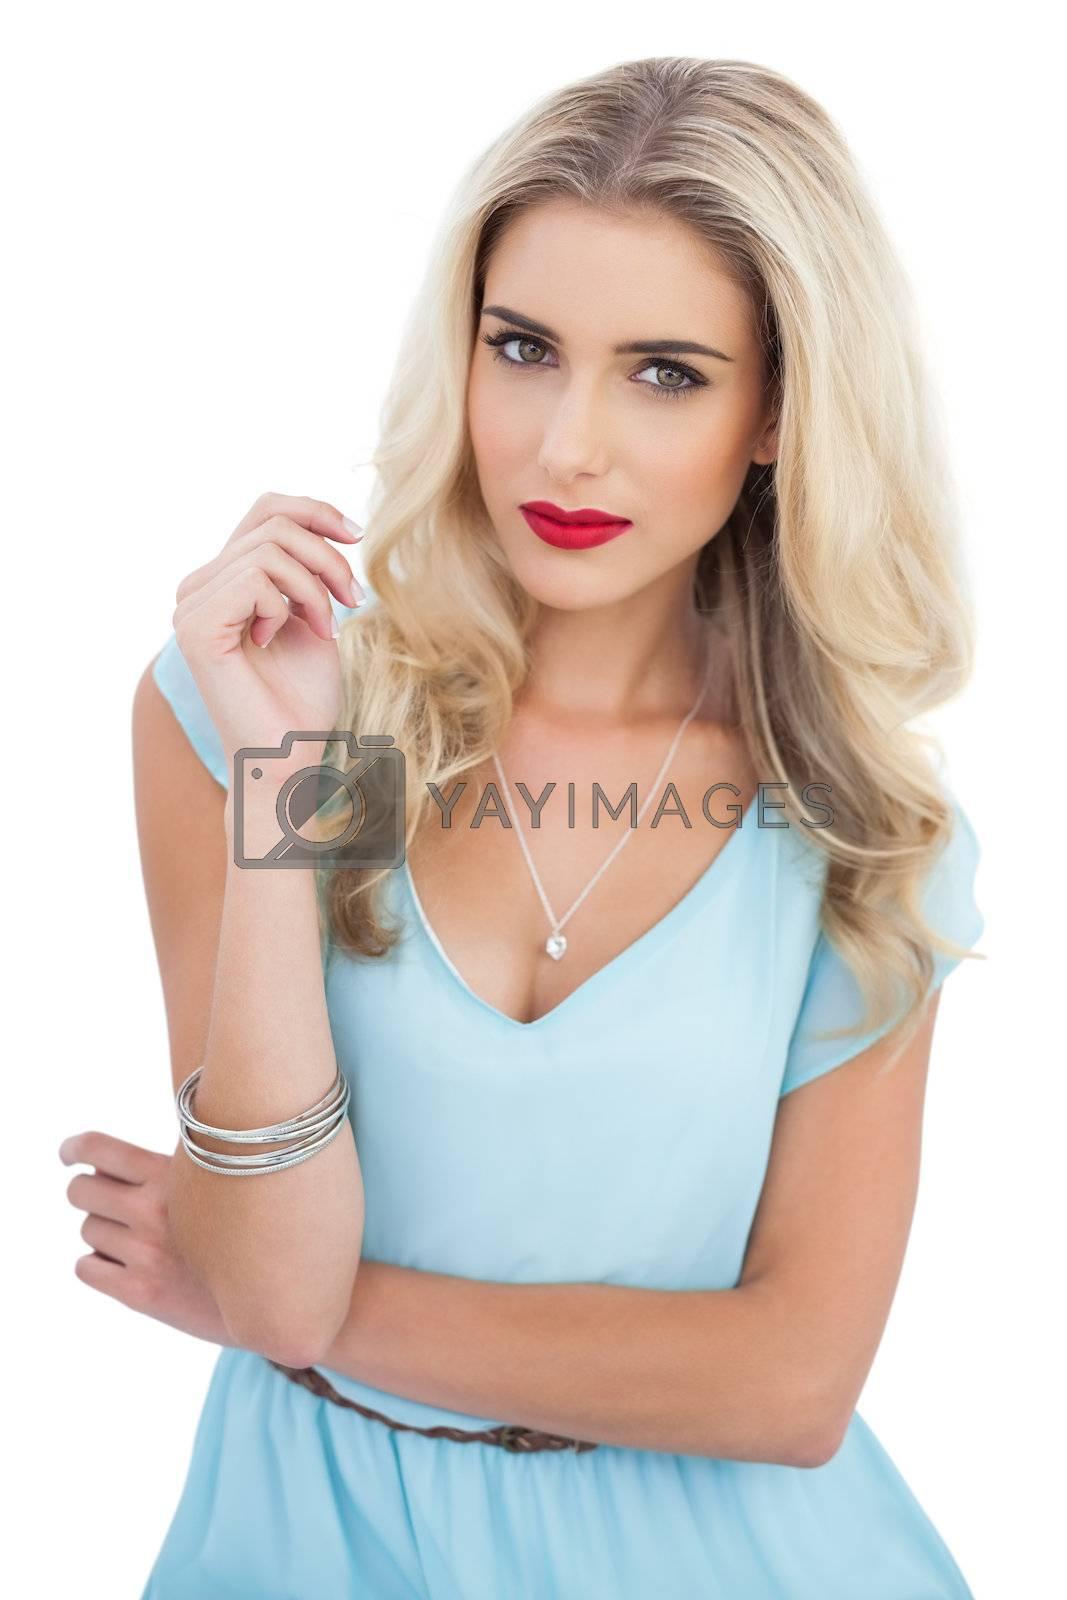 Dreamy blonde model in blue dress looking at camera by Wavebreakmedia